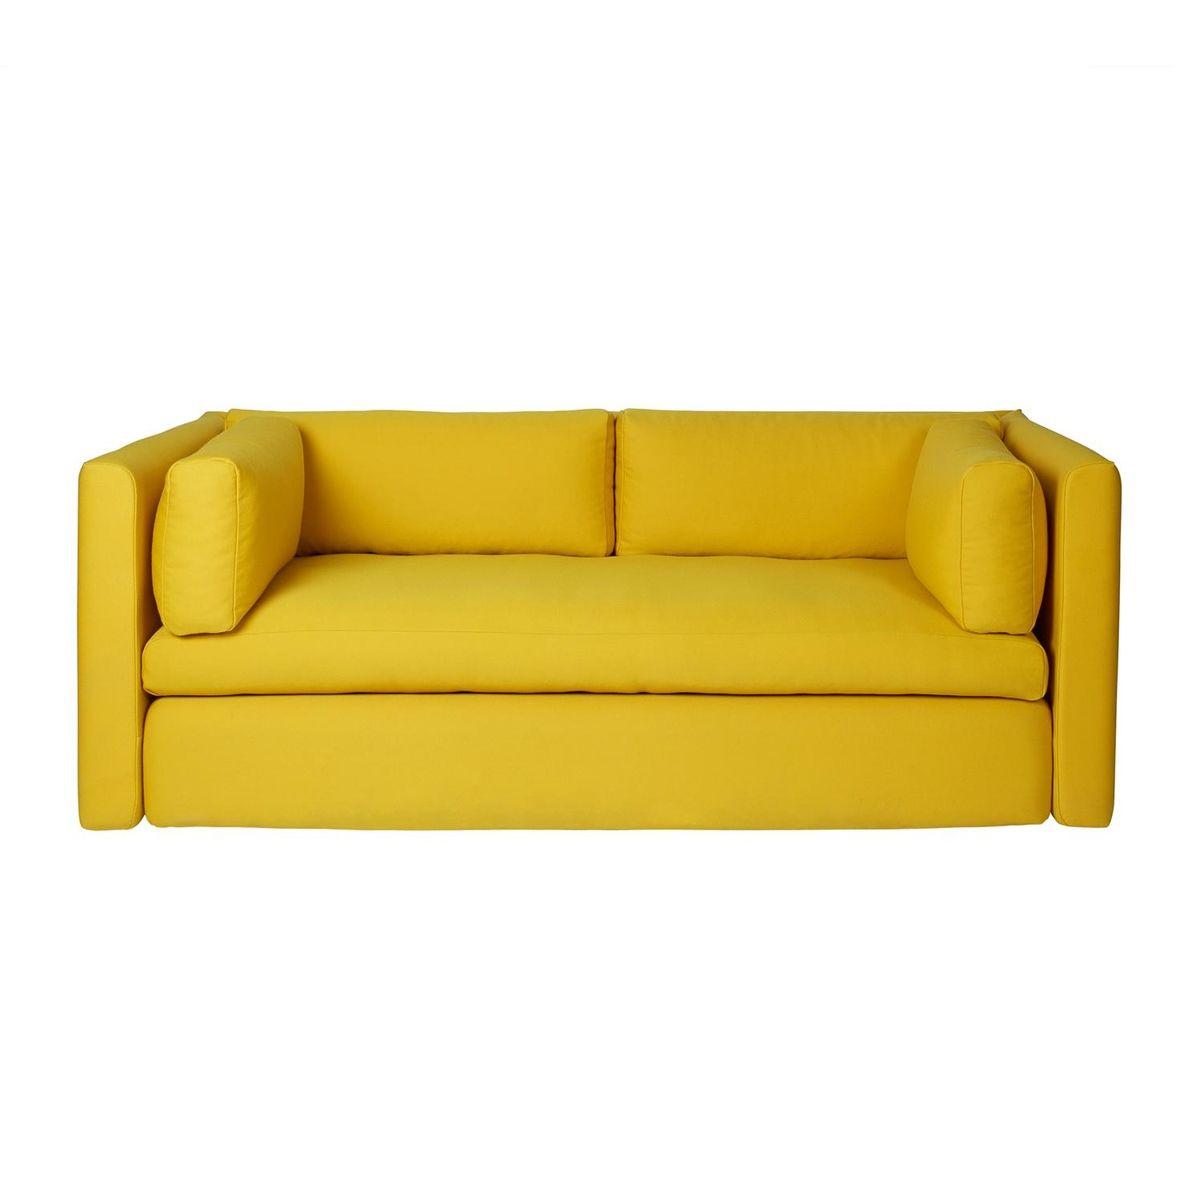 hackney 2 seater sofa hay. Black Bedroom Furniture Sets. Home Design Ideas